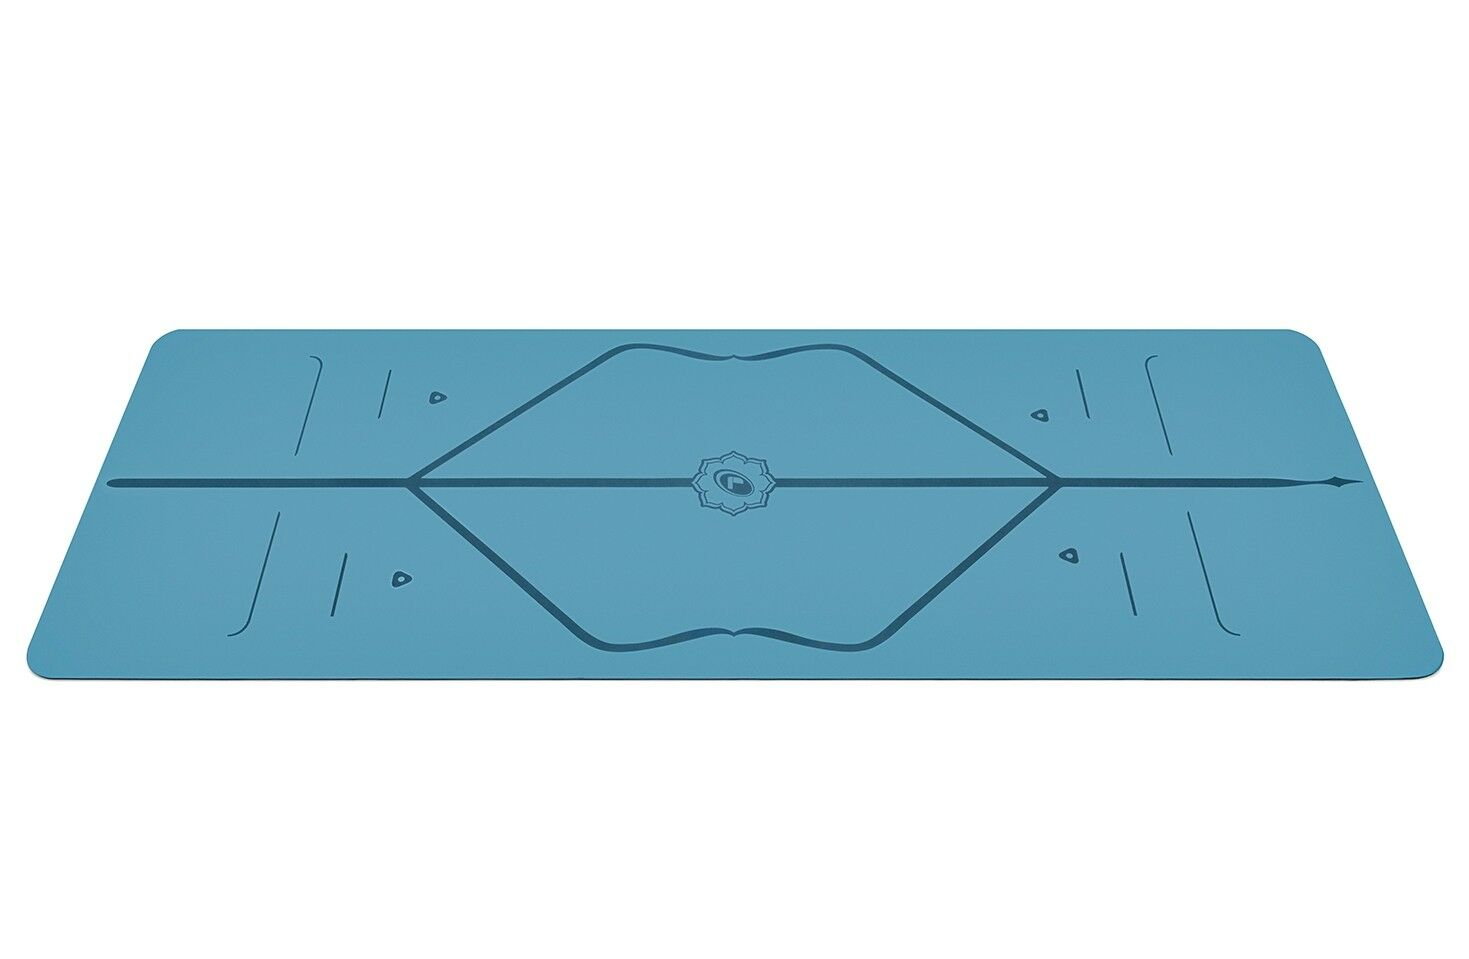 The Liforme Yoga Mat With Bag Friendly Eco Friendly Bag Non Slip Truly Revolutionary Blau d752a6